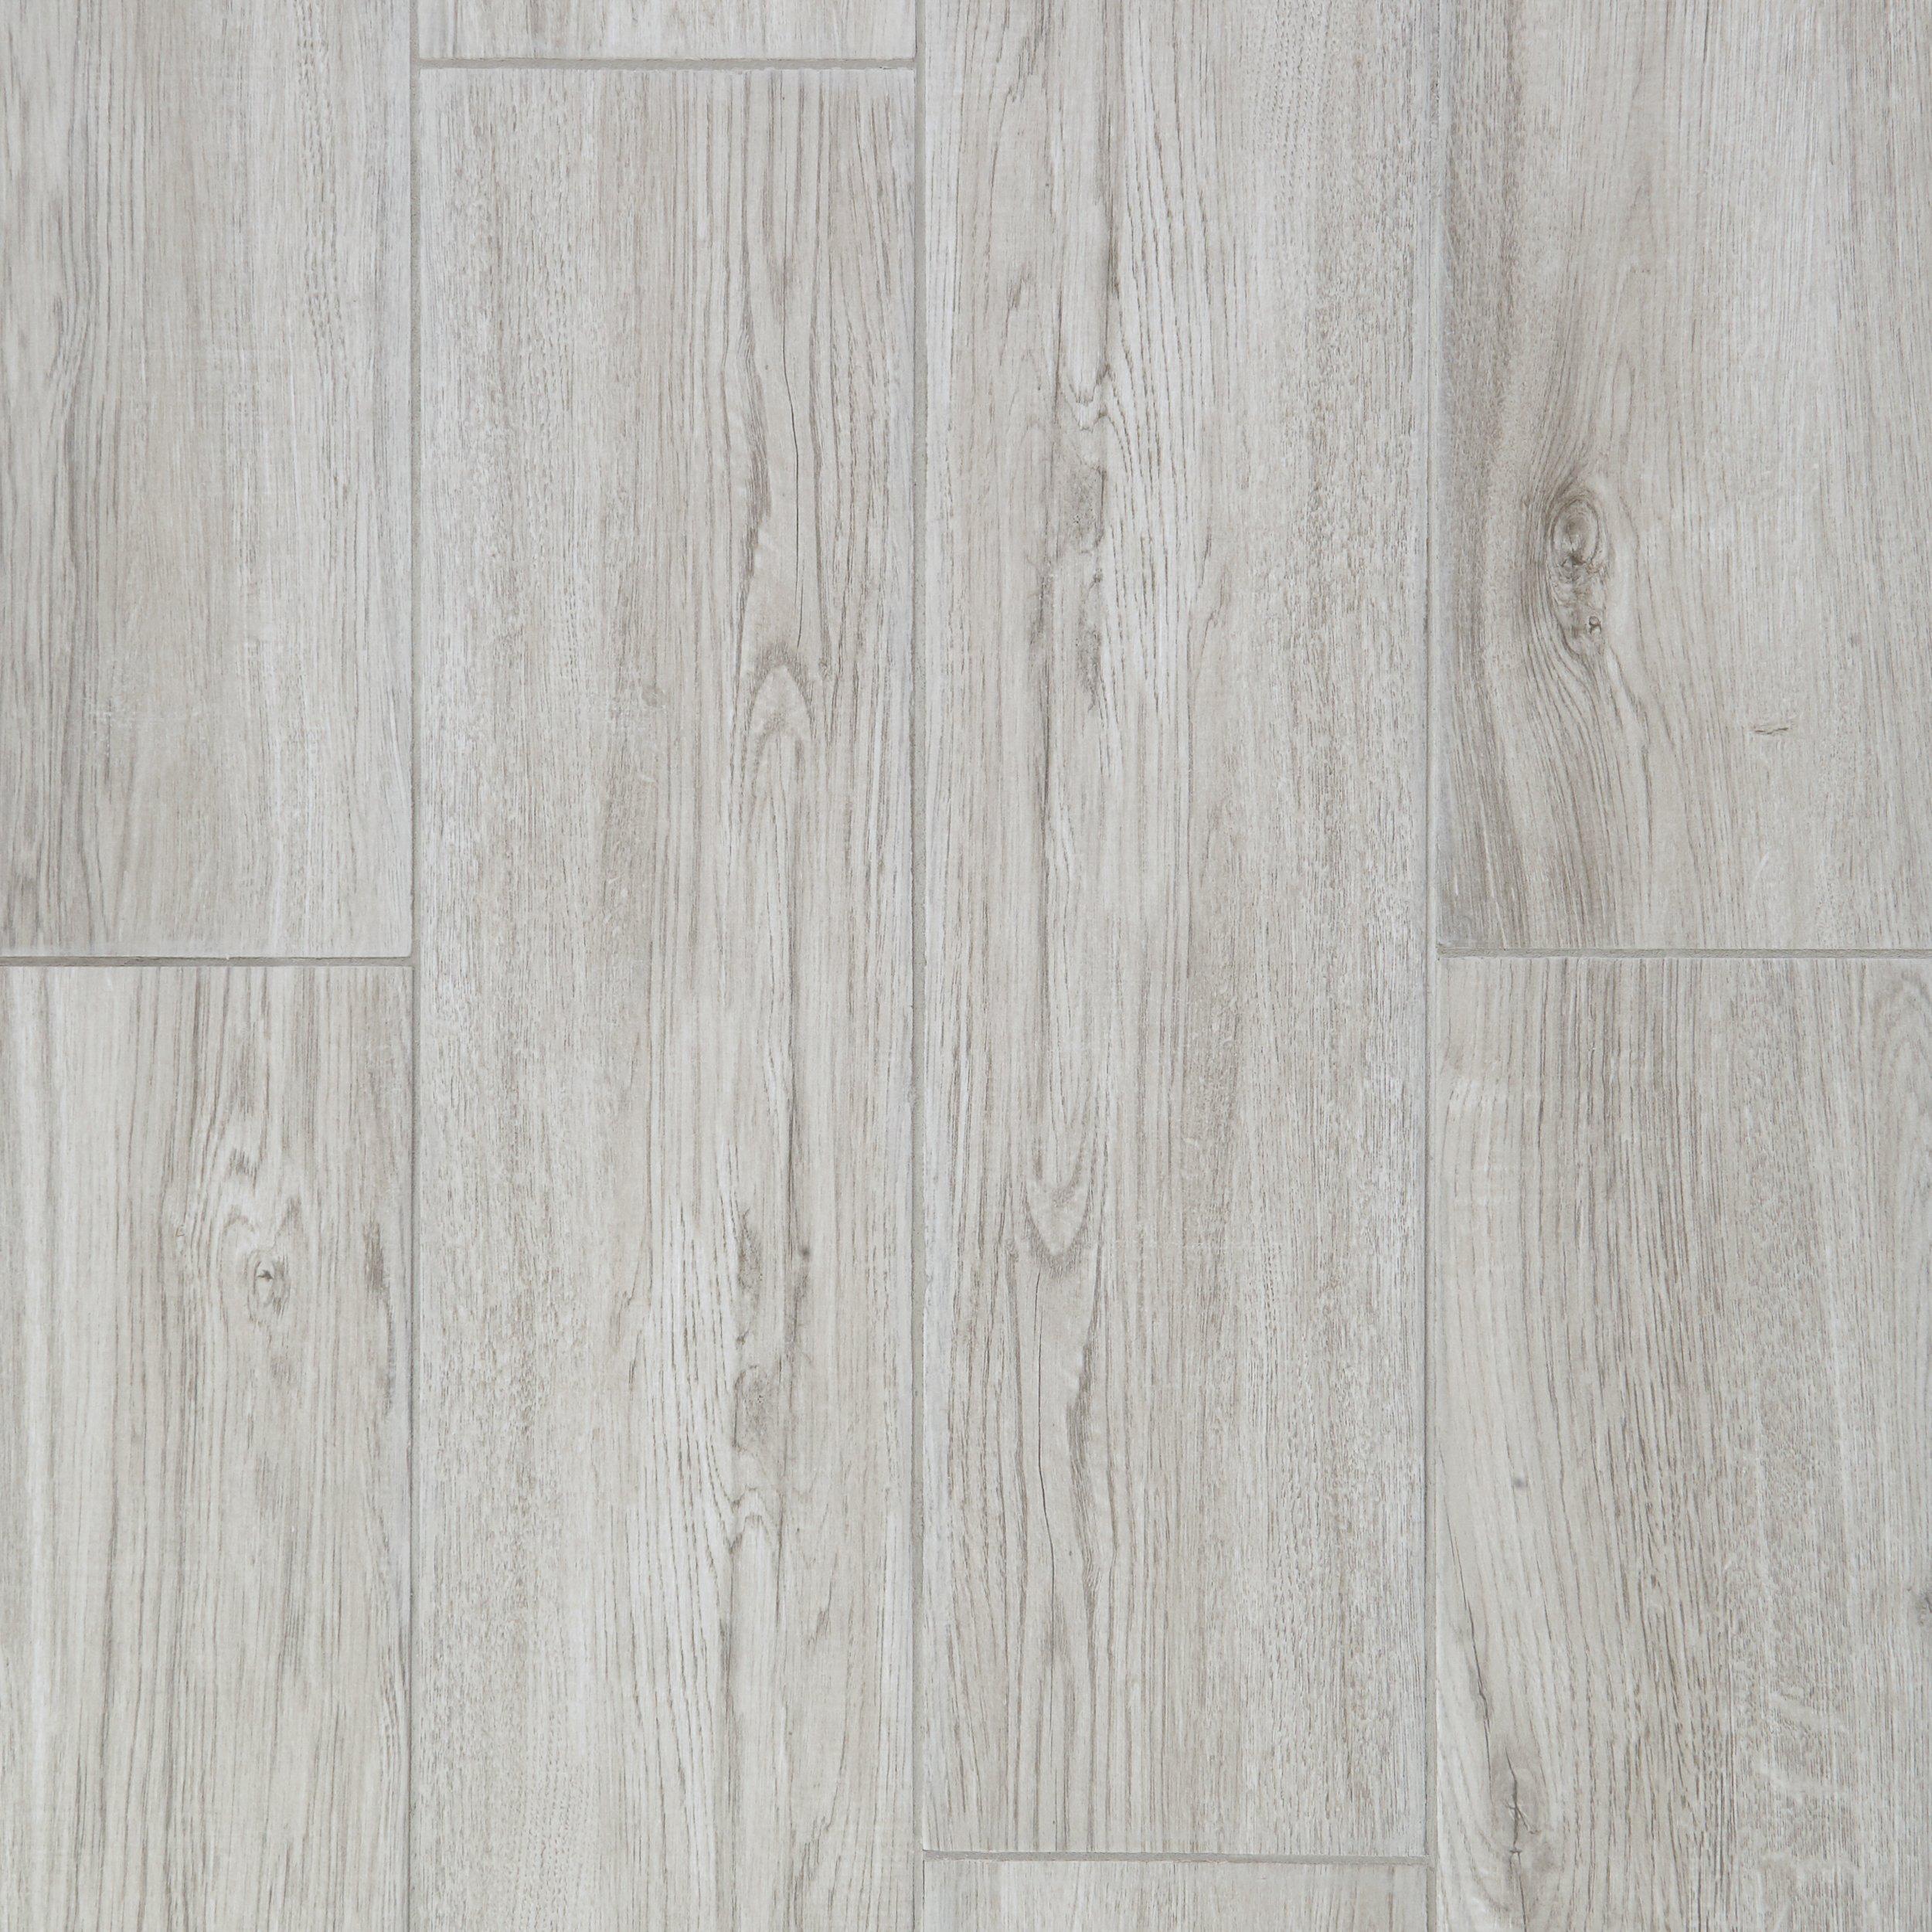 Hard Gray Wood Plank Porcelain Tile - 6 x 24 - 100198712   Floor and ...